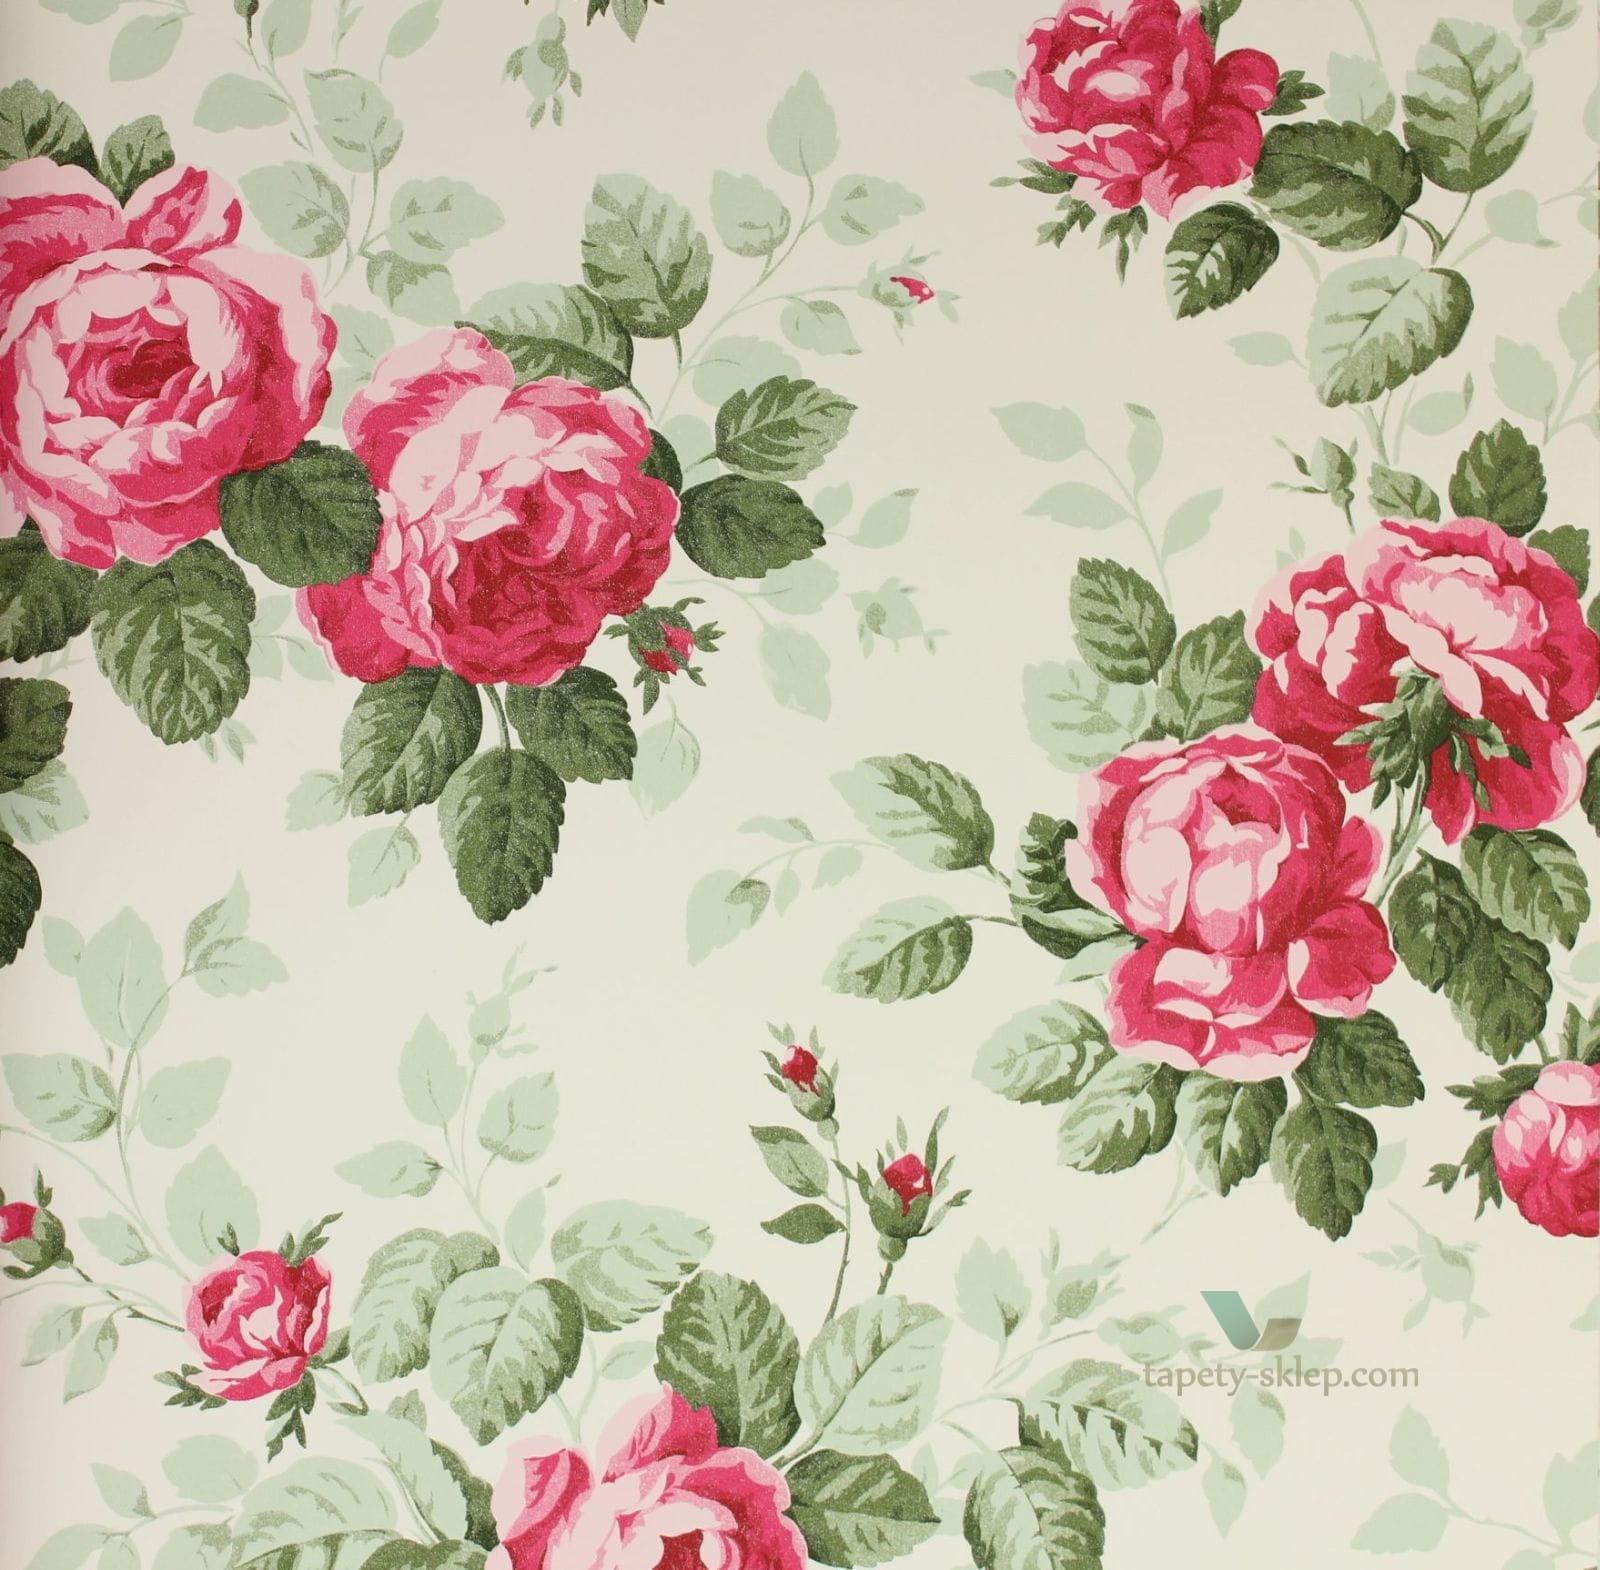 Tapeta w kwiaty Igone Bloomingdale 326138  Bloomingdale